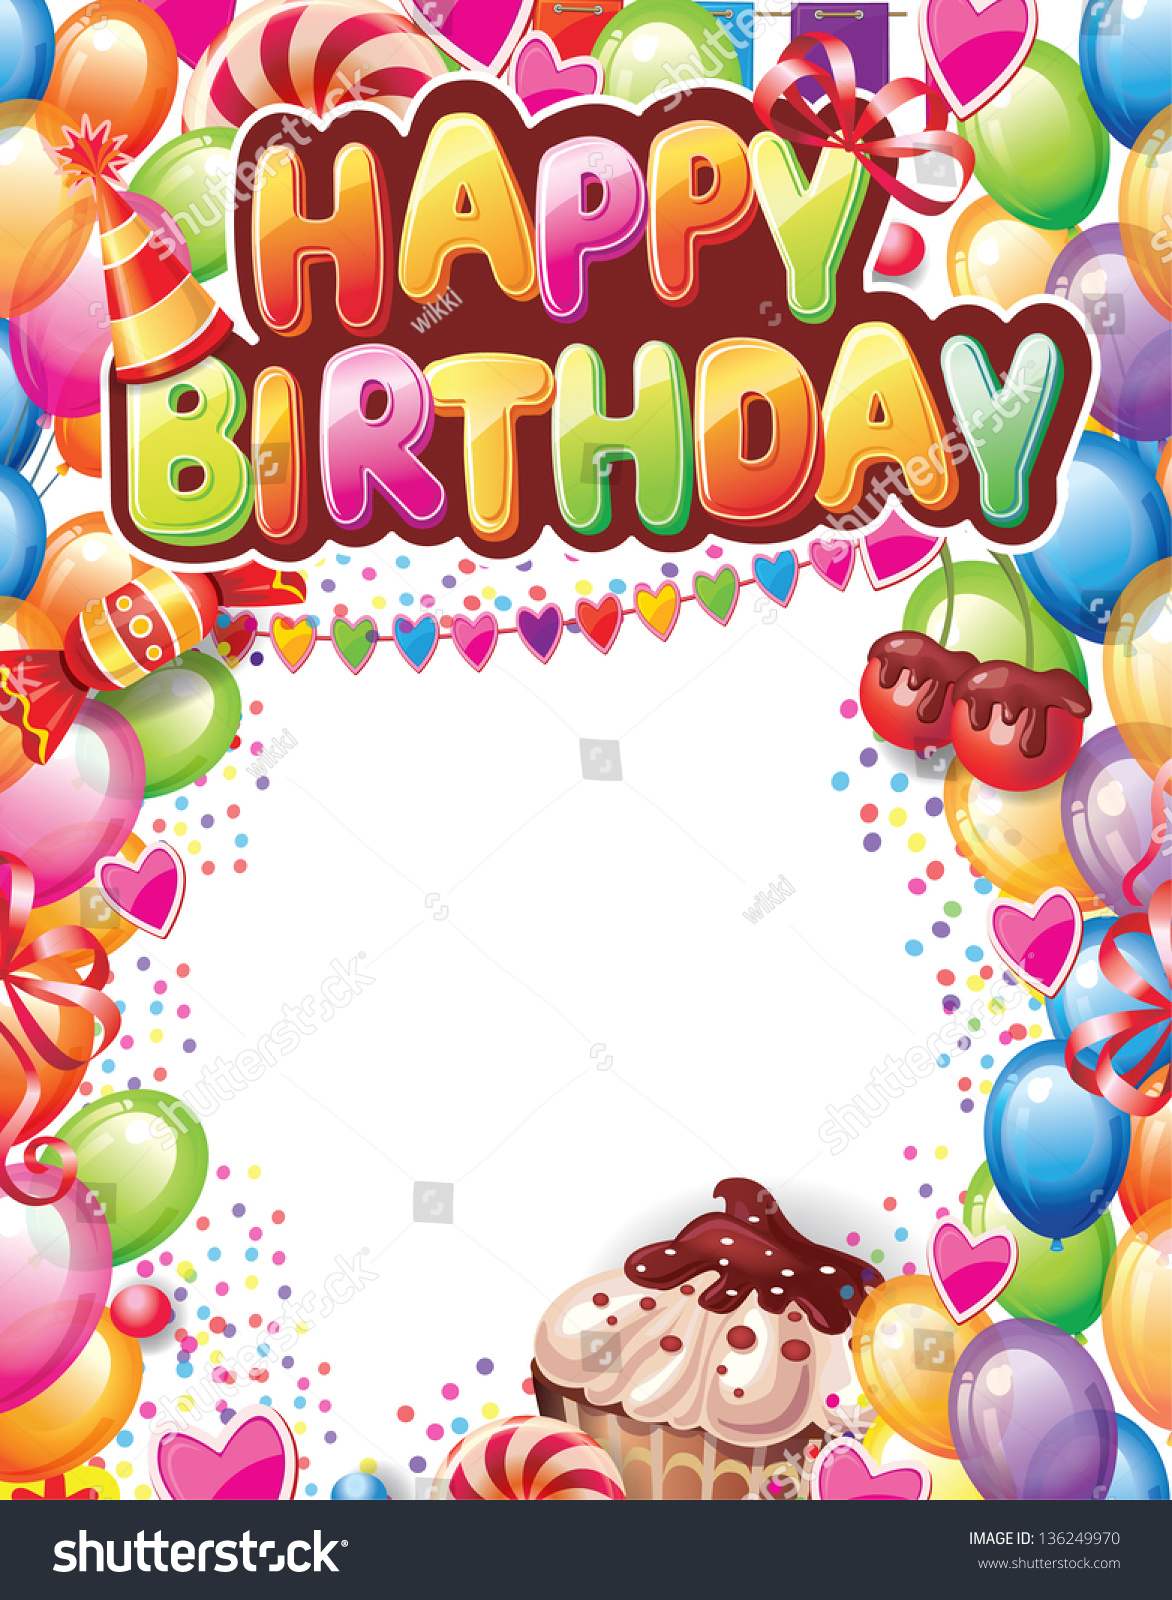 Birthday Template Word happy birthday sunshine happy birthday – Word Birthday Template